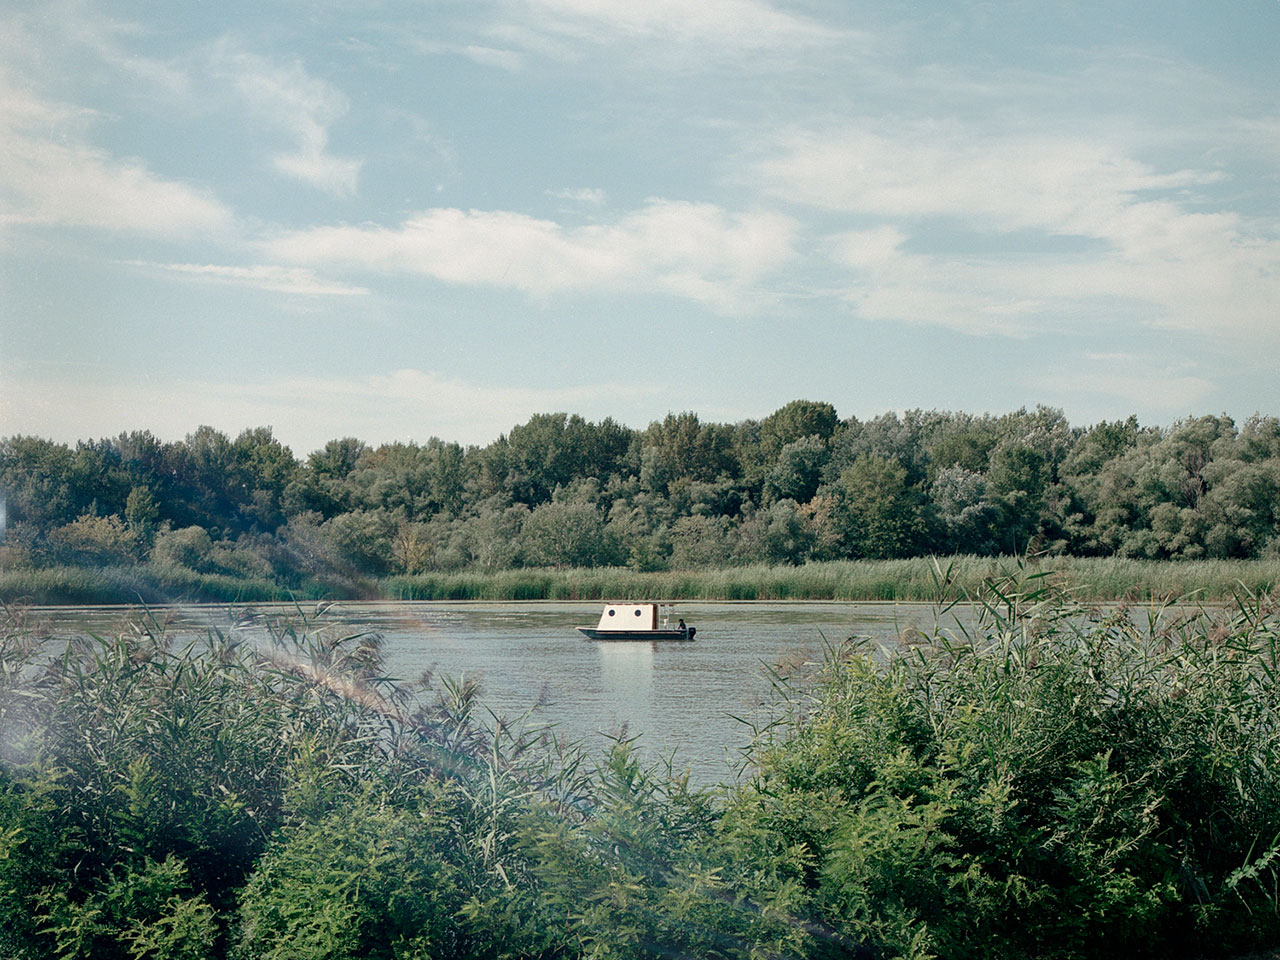 Photography by Balázs Máté.